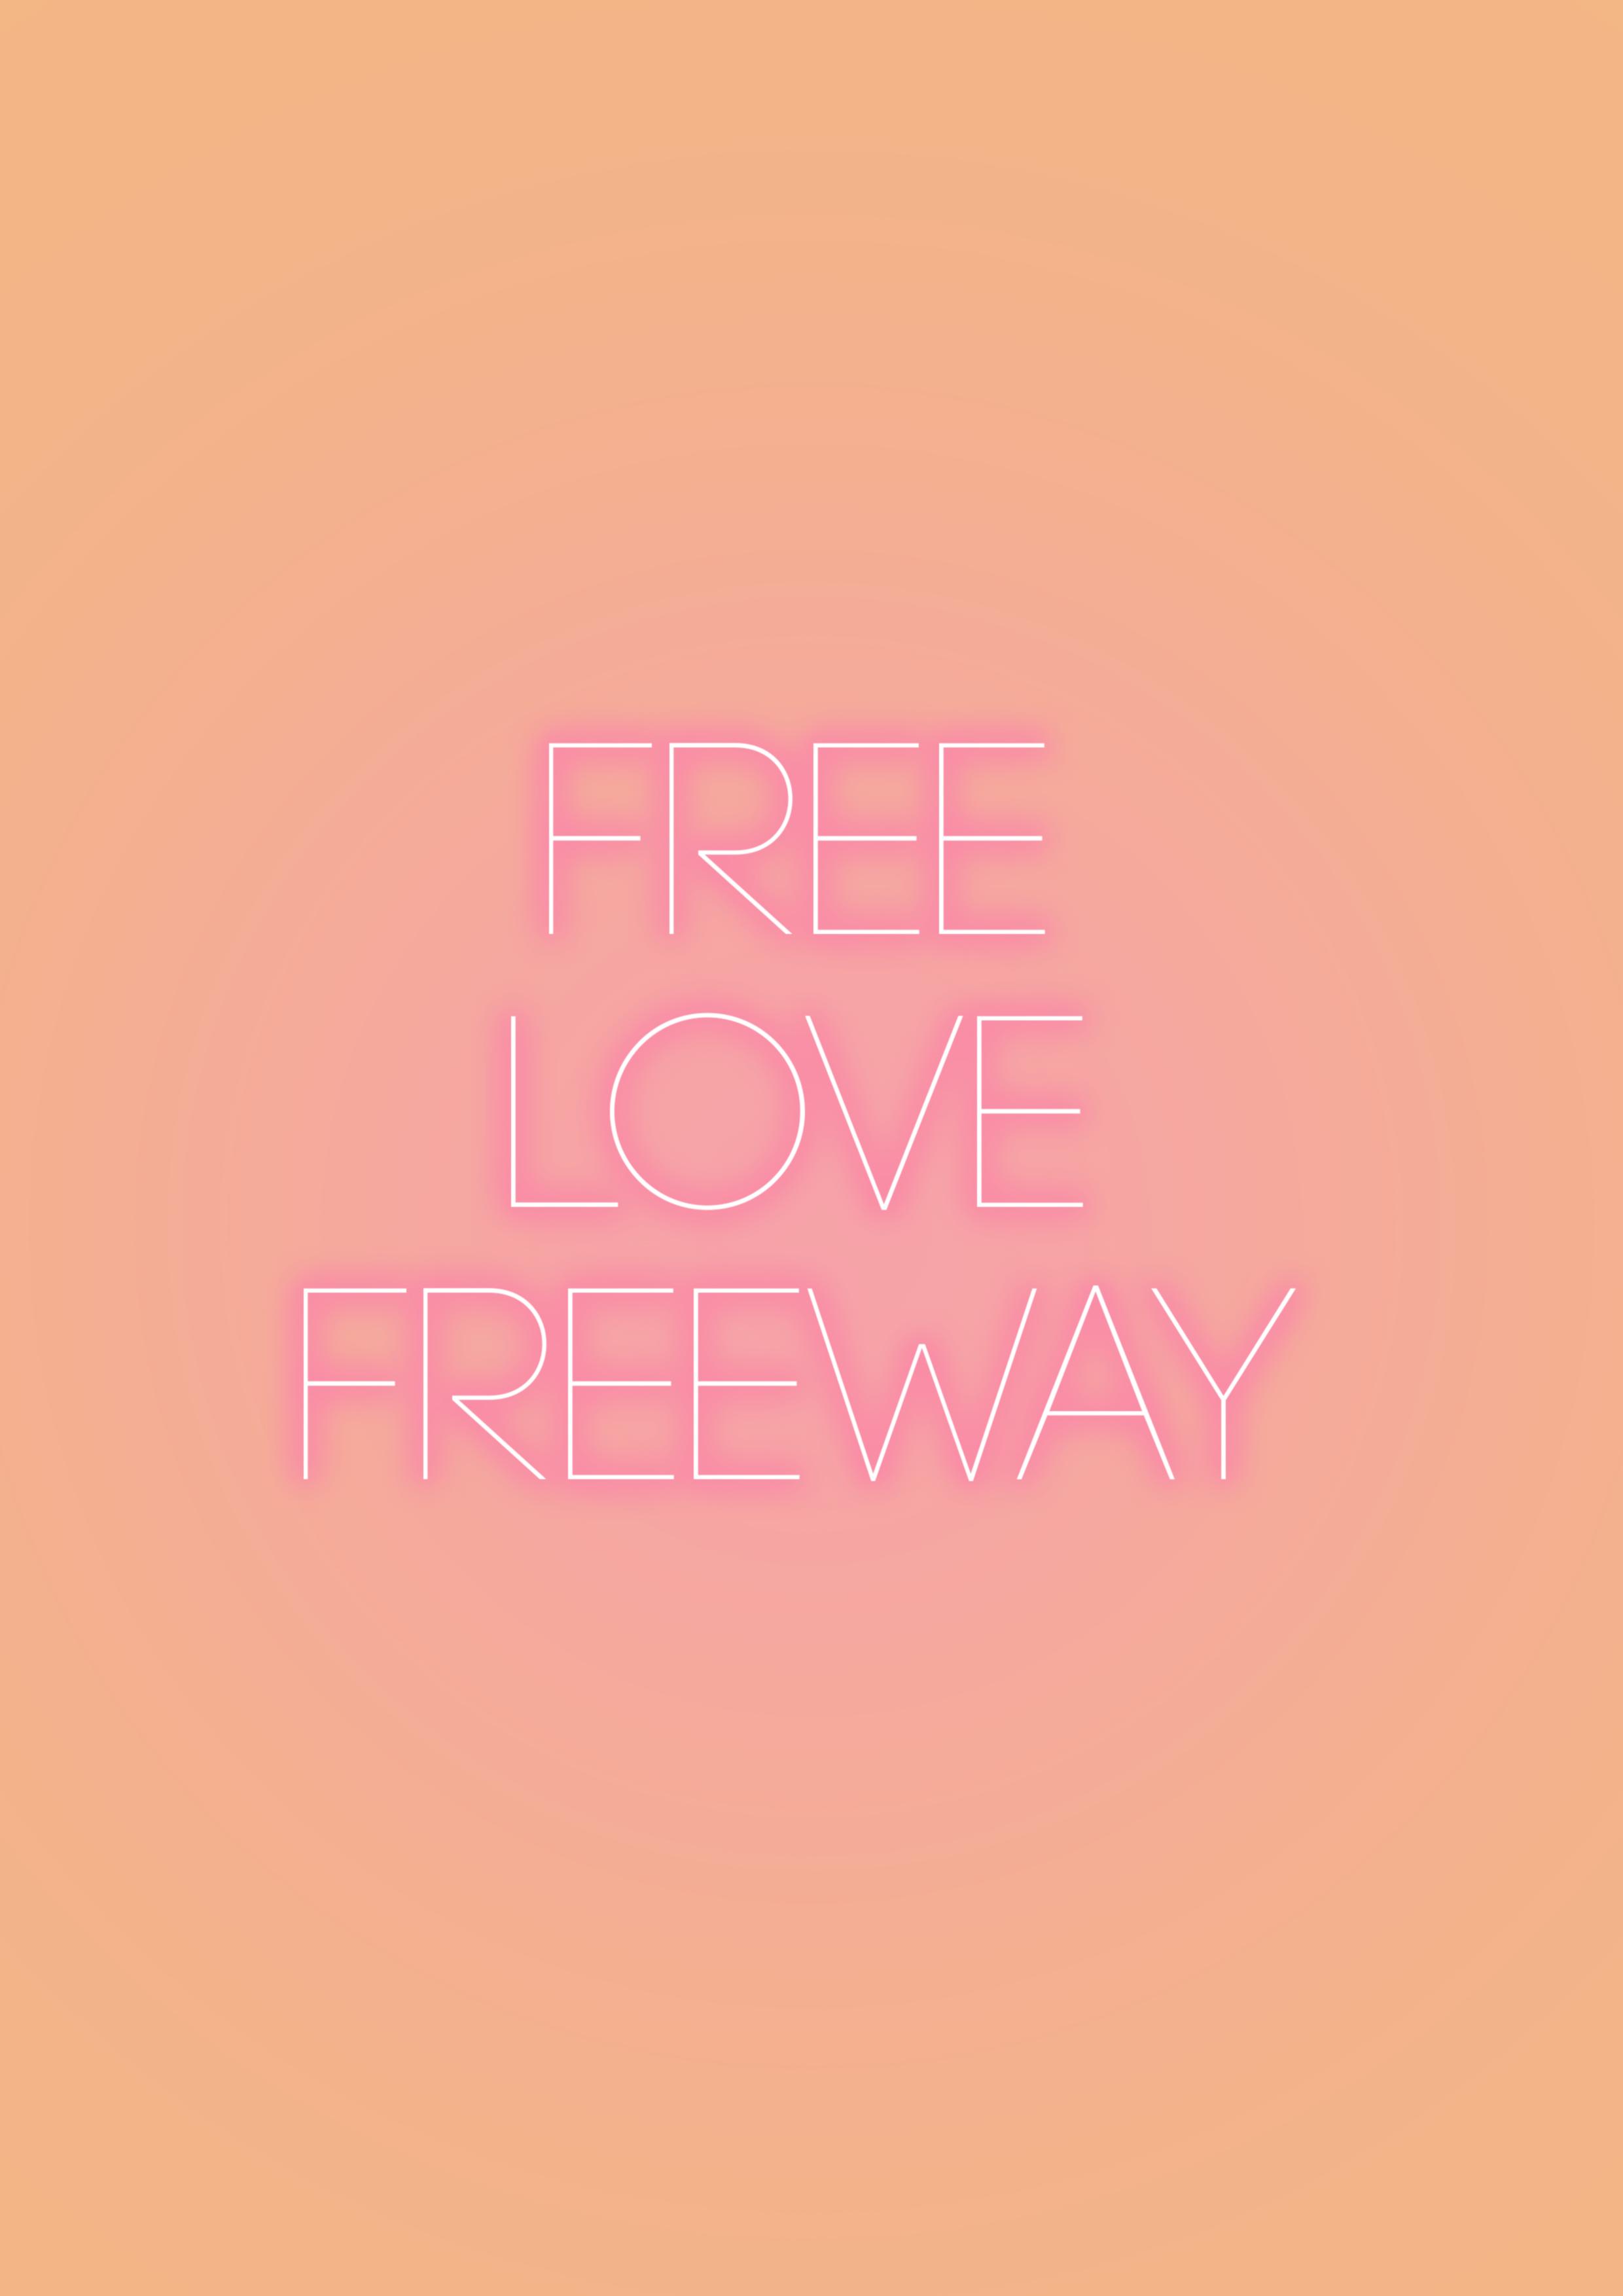 Neon free love freeway.png